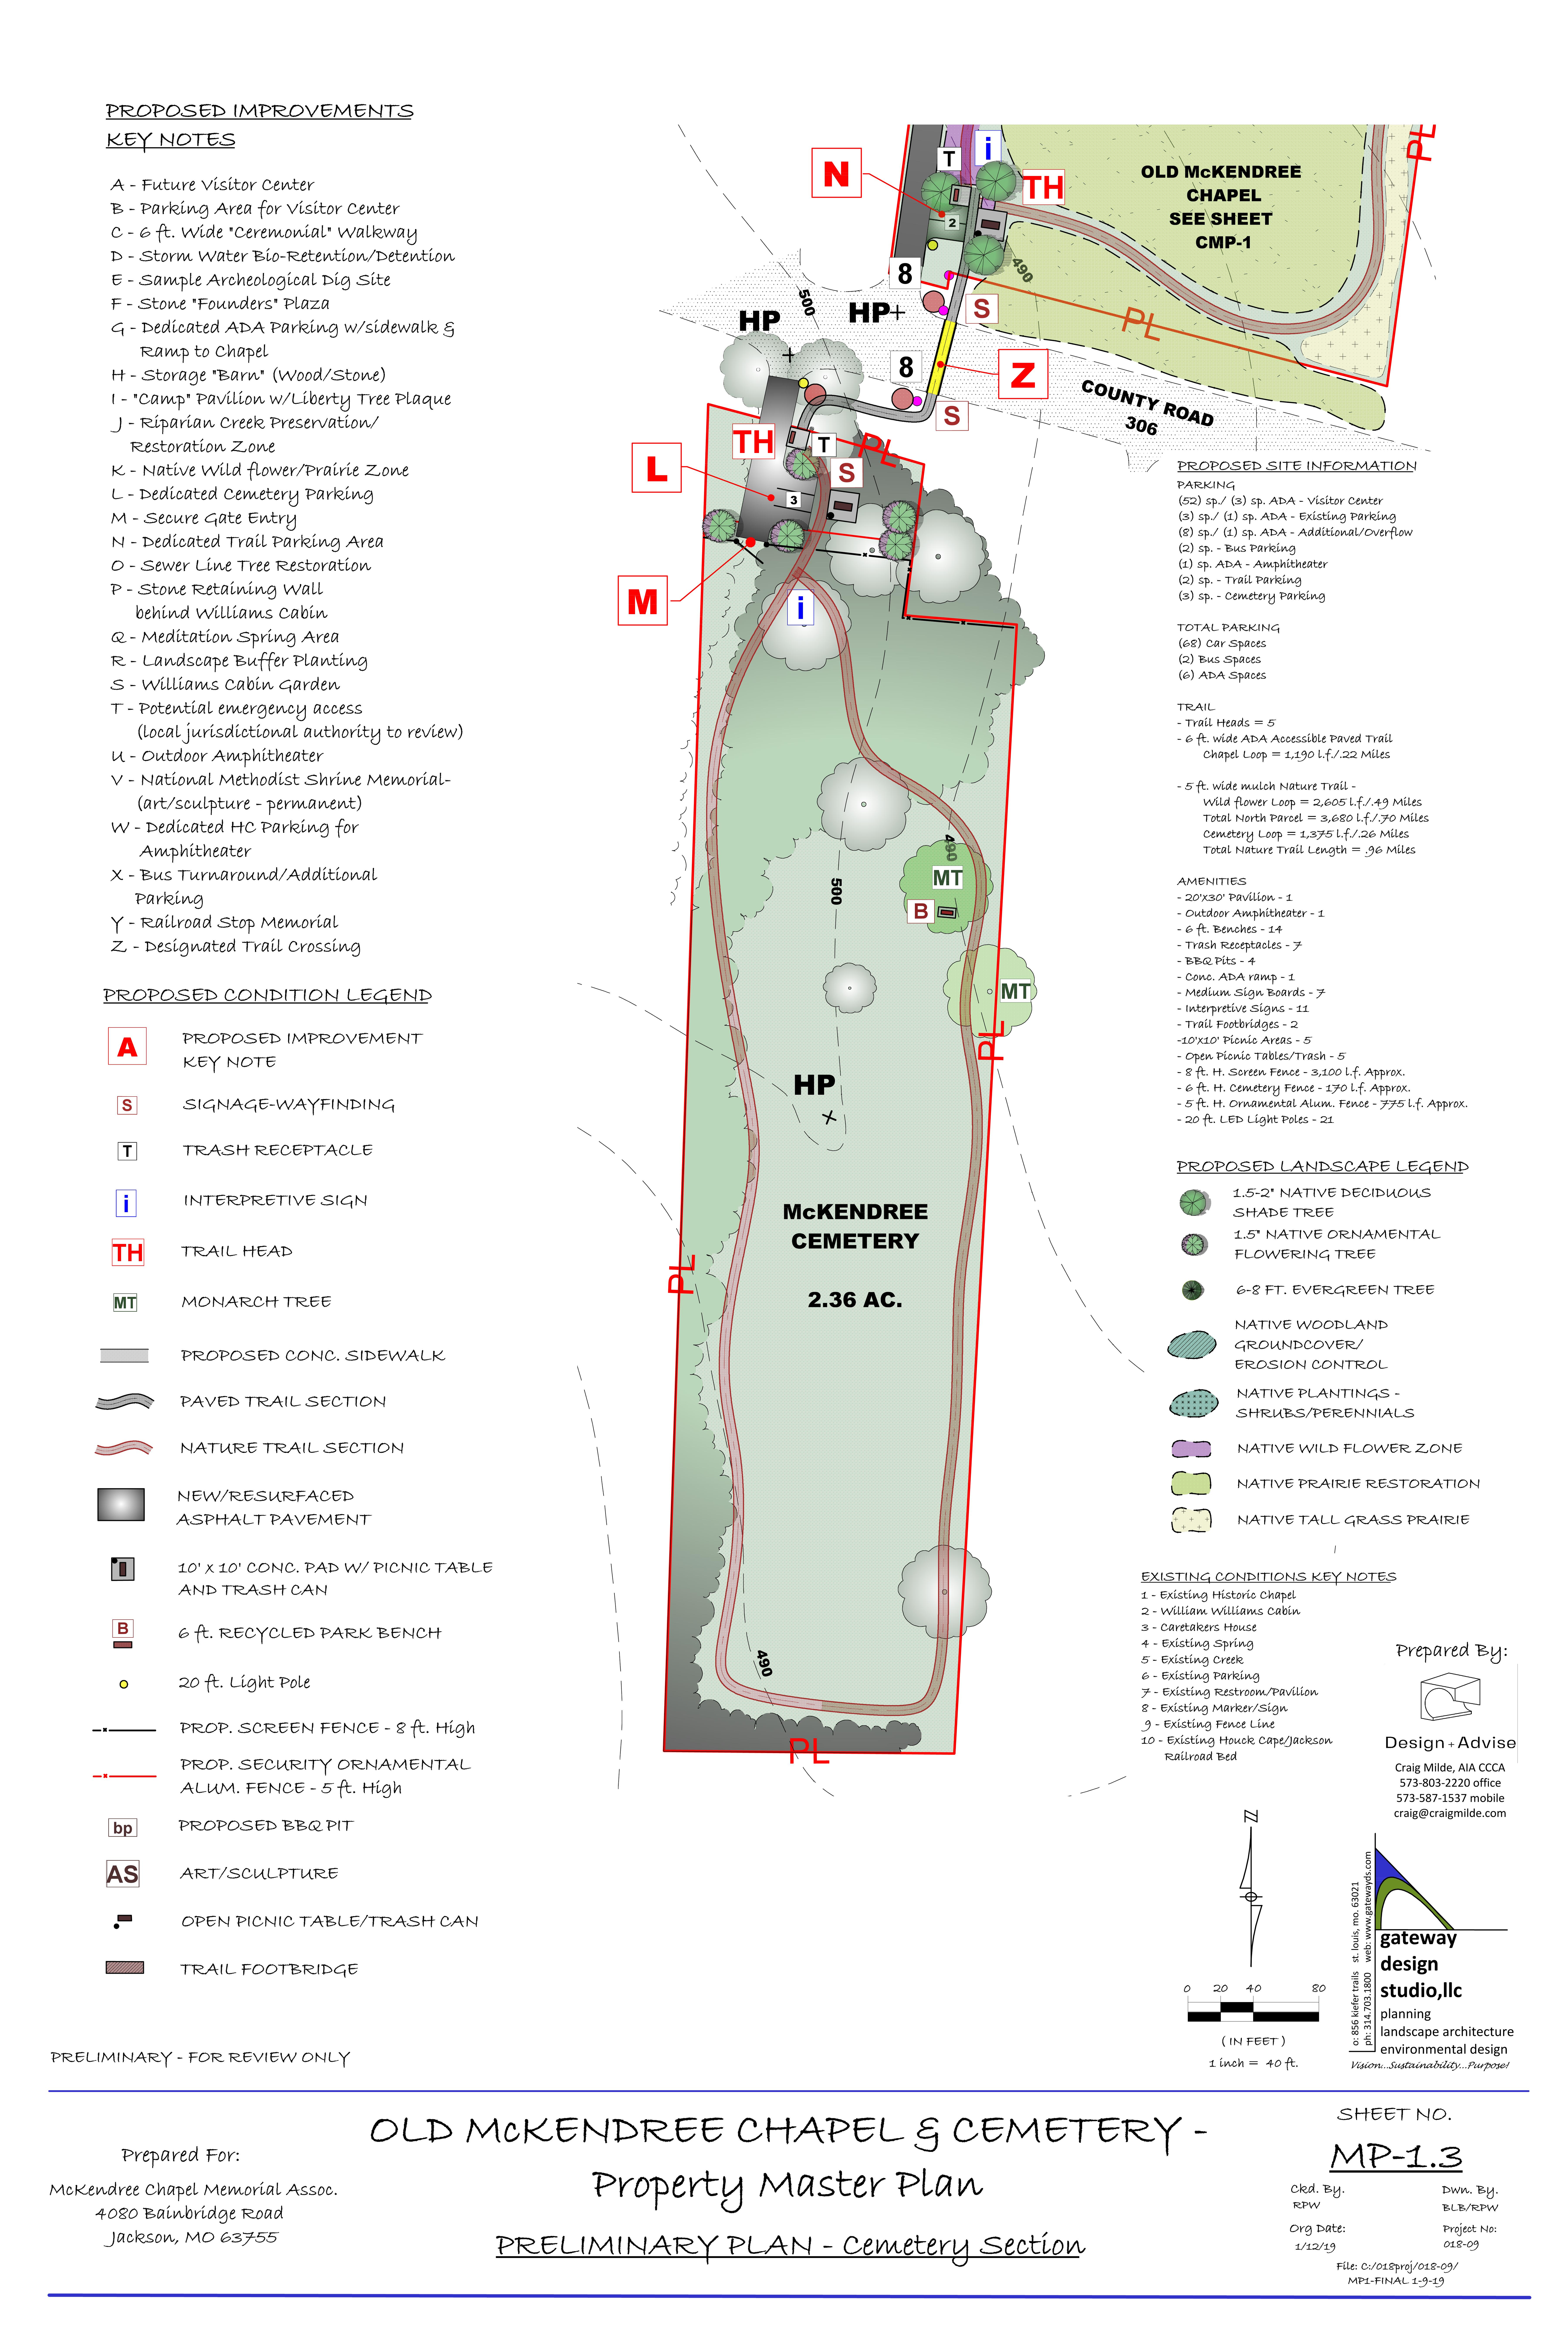 Master Plan - Cemetery Site